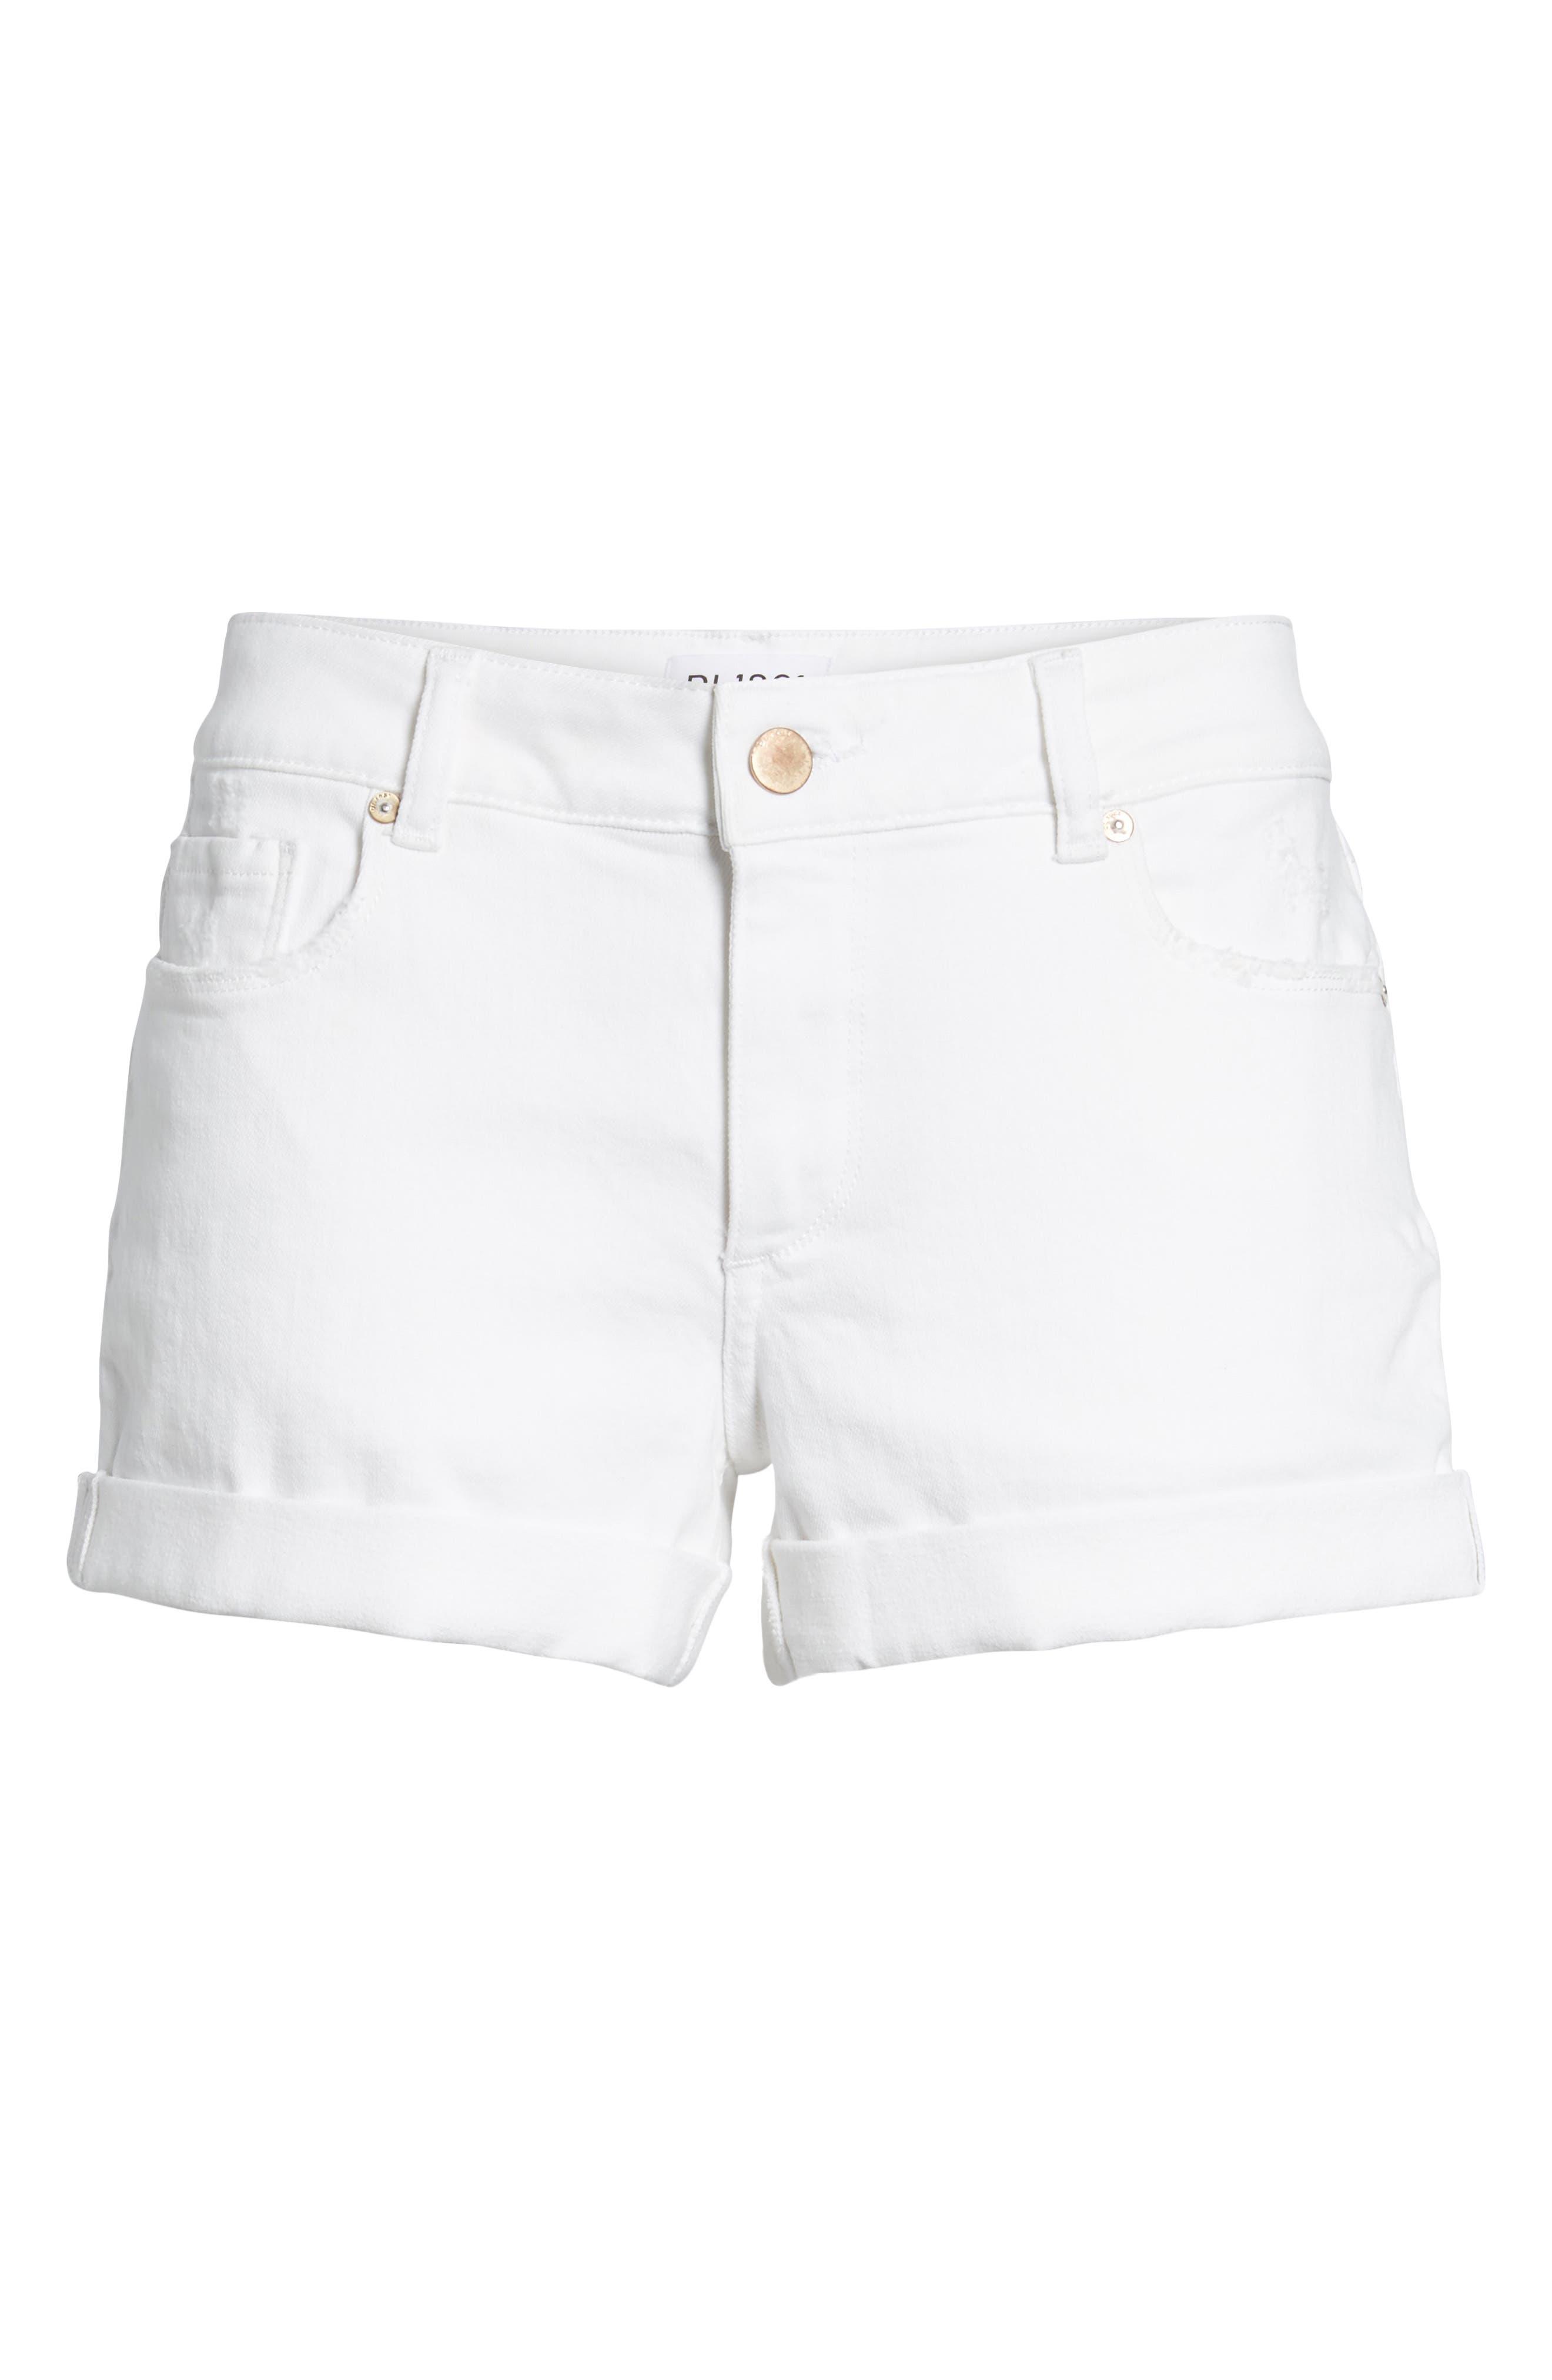 Renee Cutoff Denim Shorts,                             Alternate thumbnail 7, color,                             020